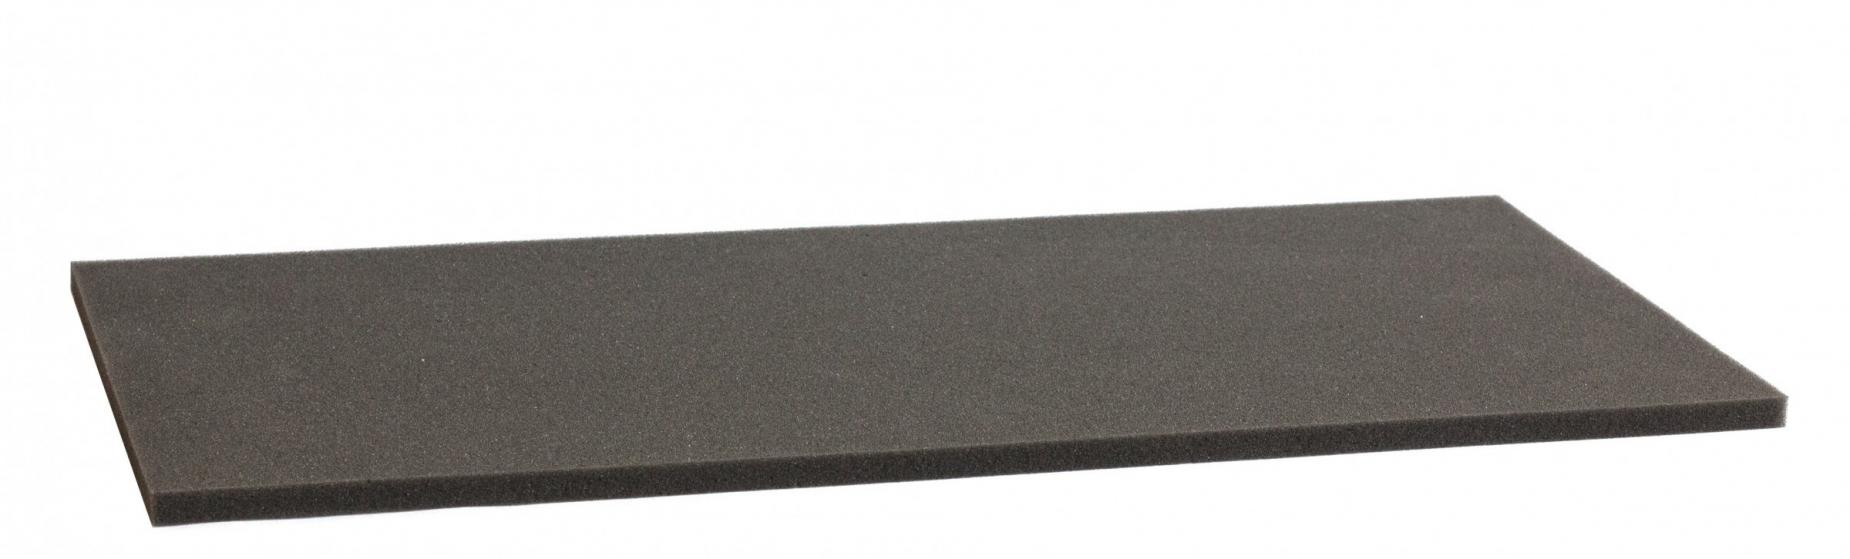 1000 mm x 500 mm x 20 mm foam sheet / cutting